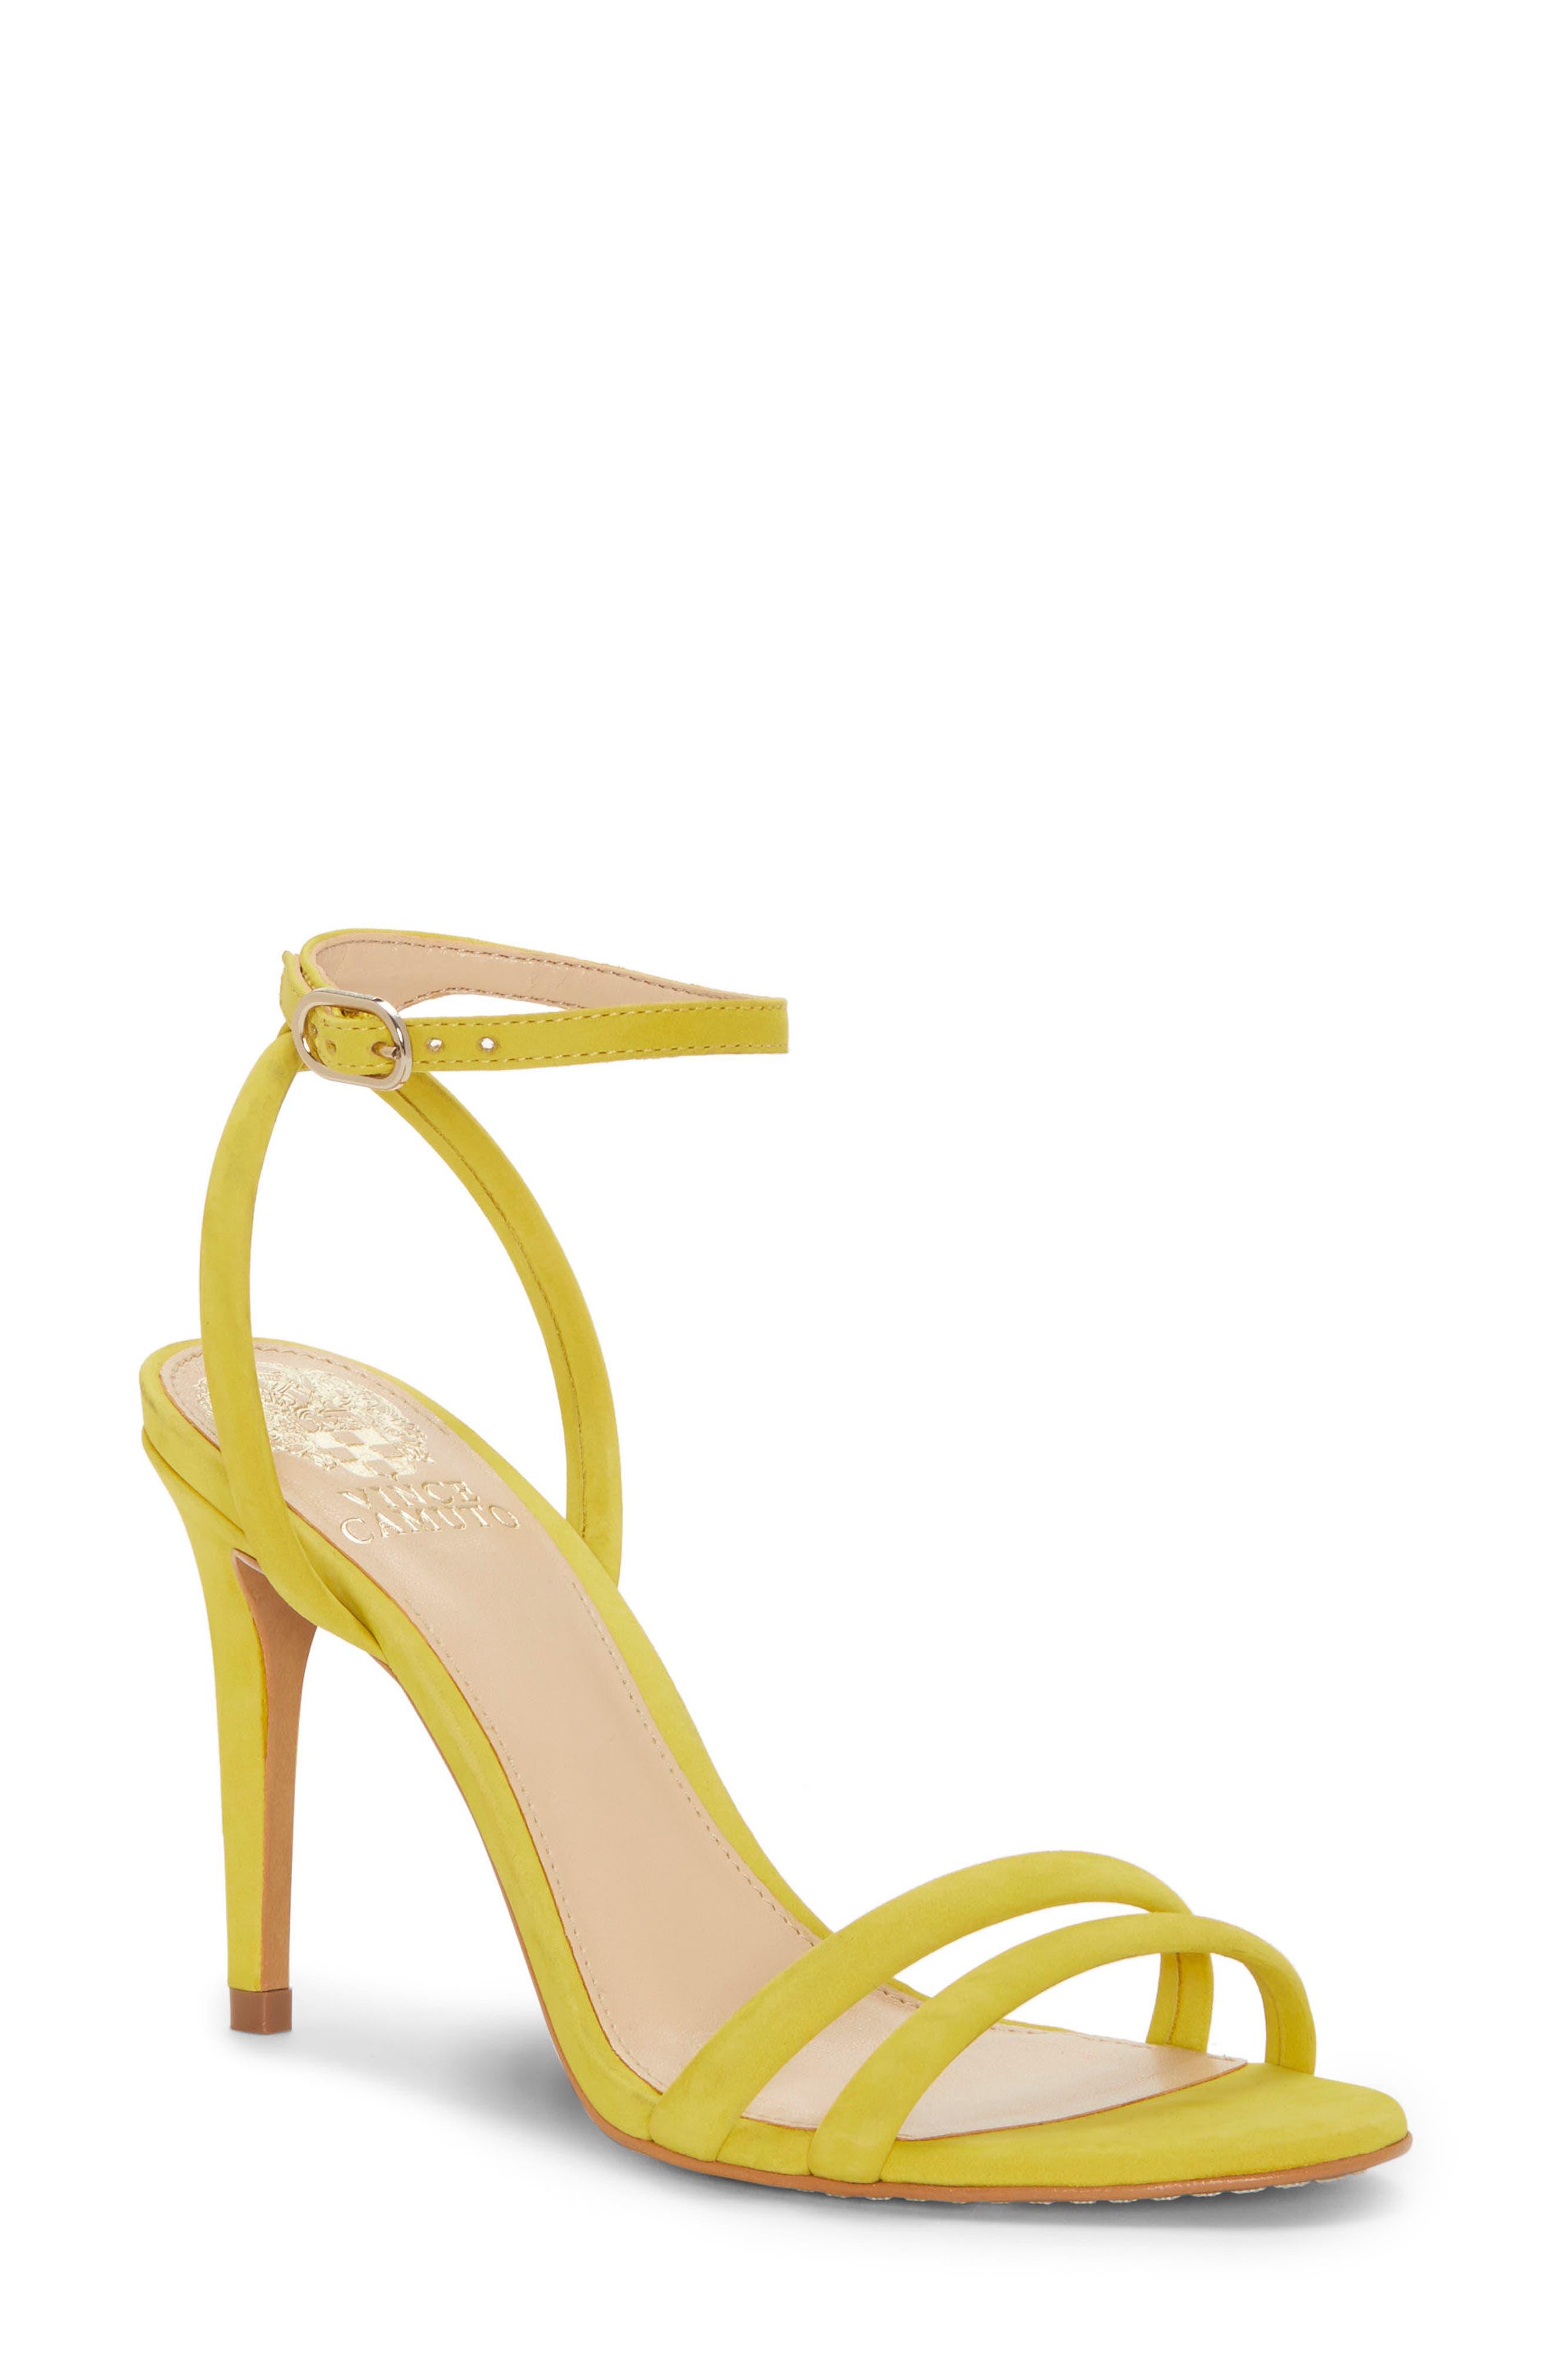 Kareenat Sandal by Vince Camuto